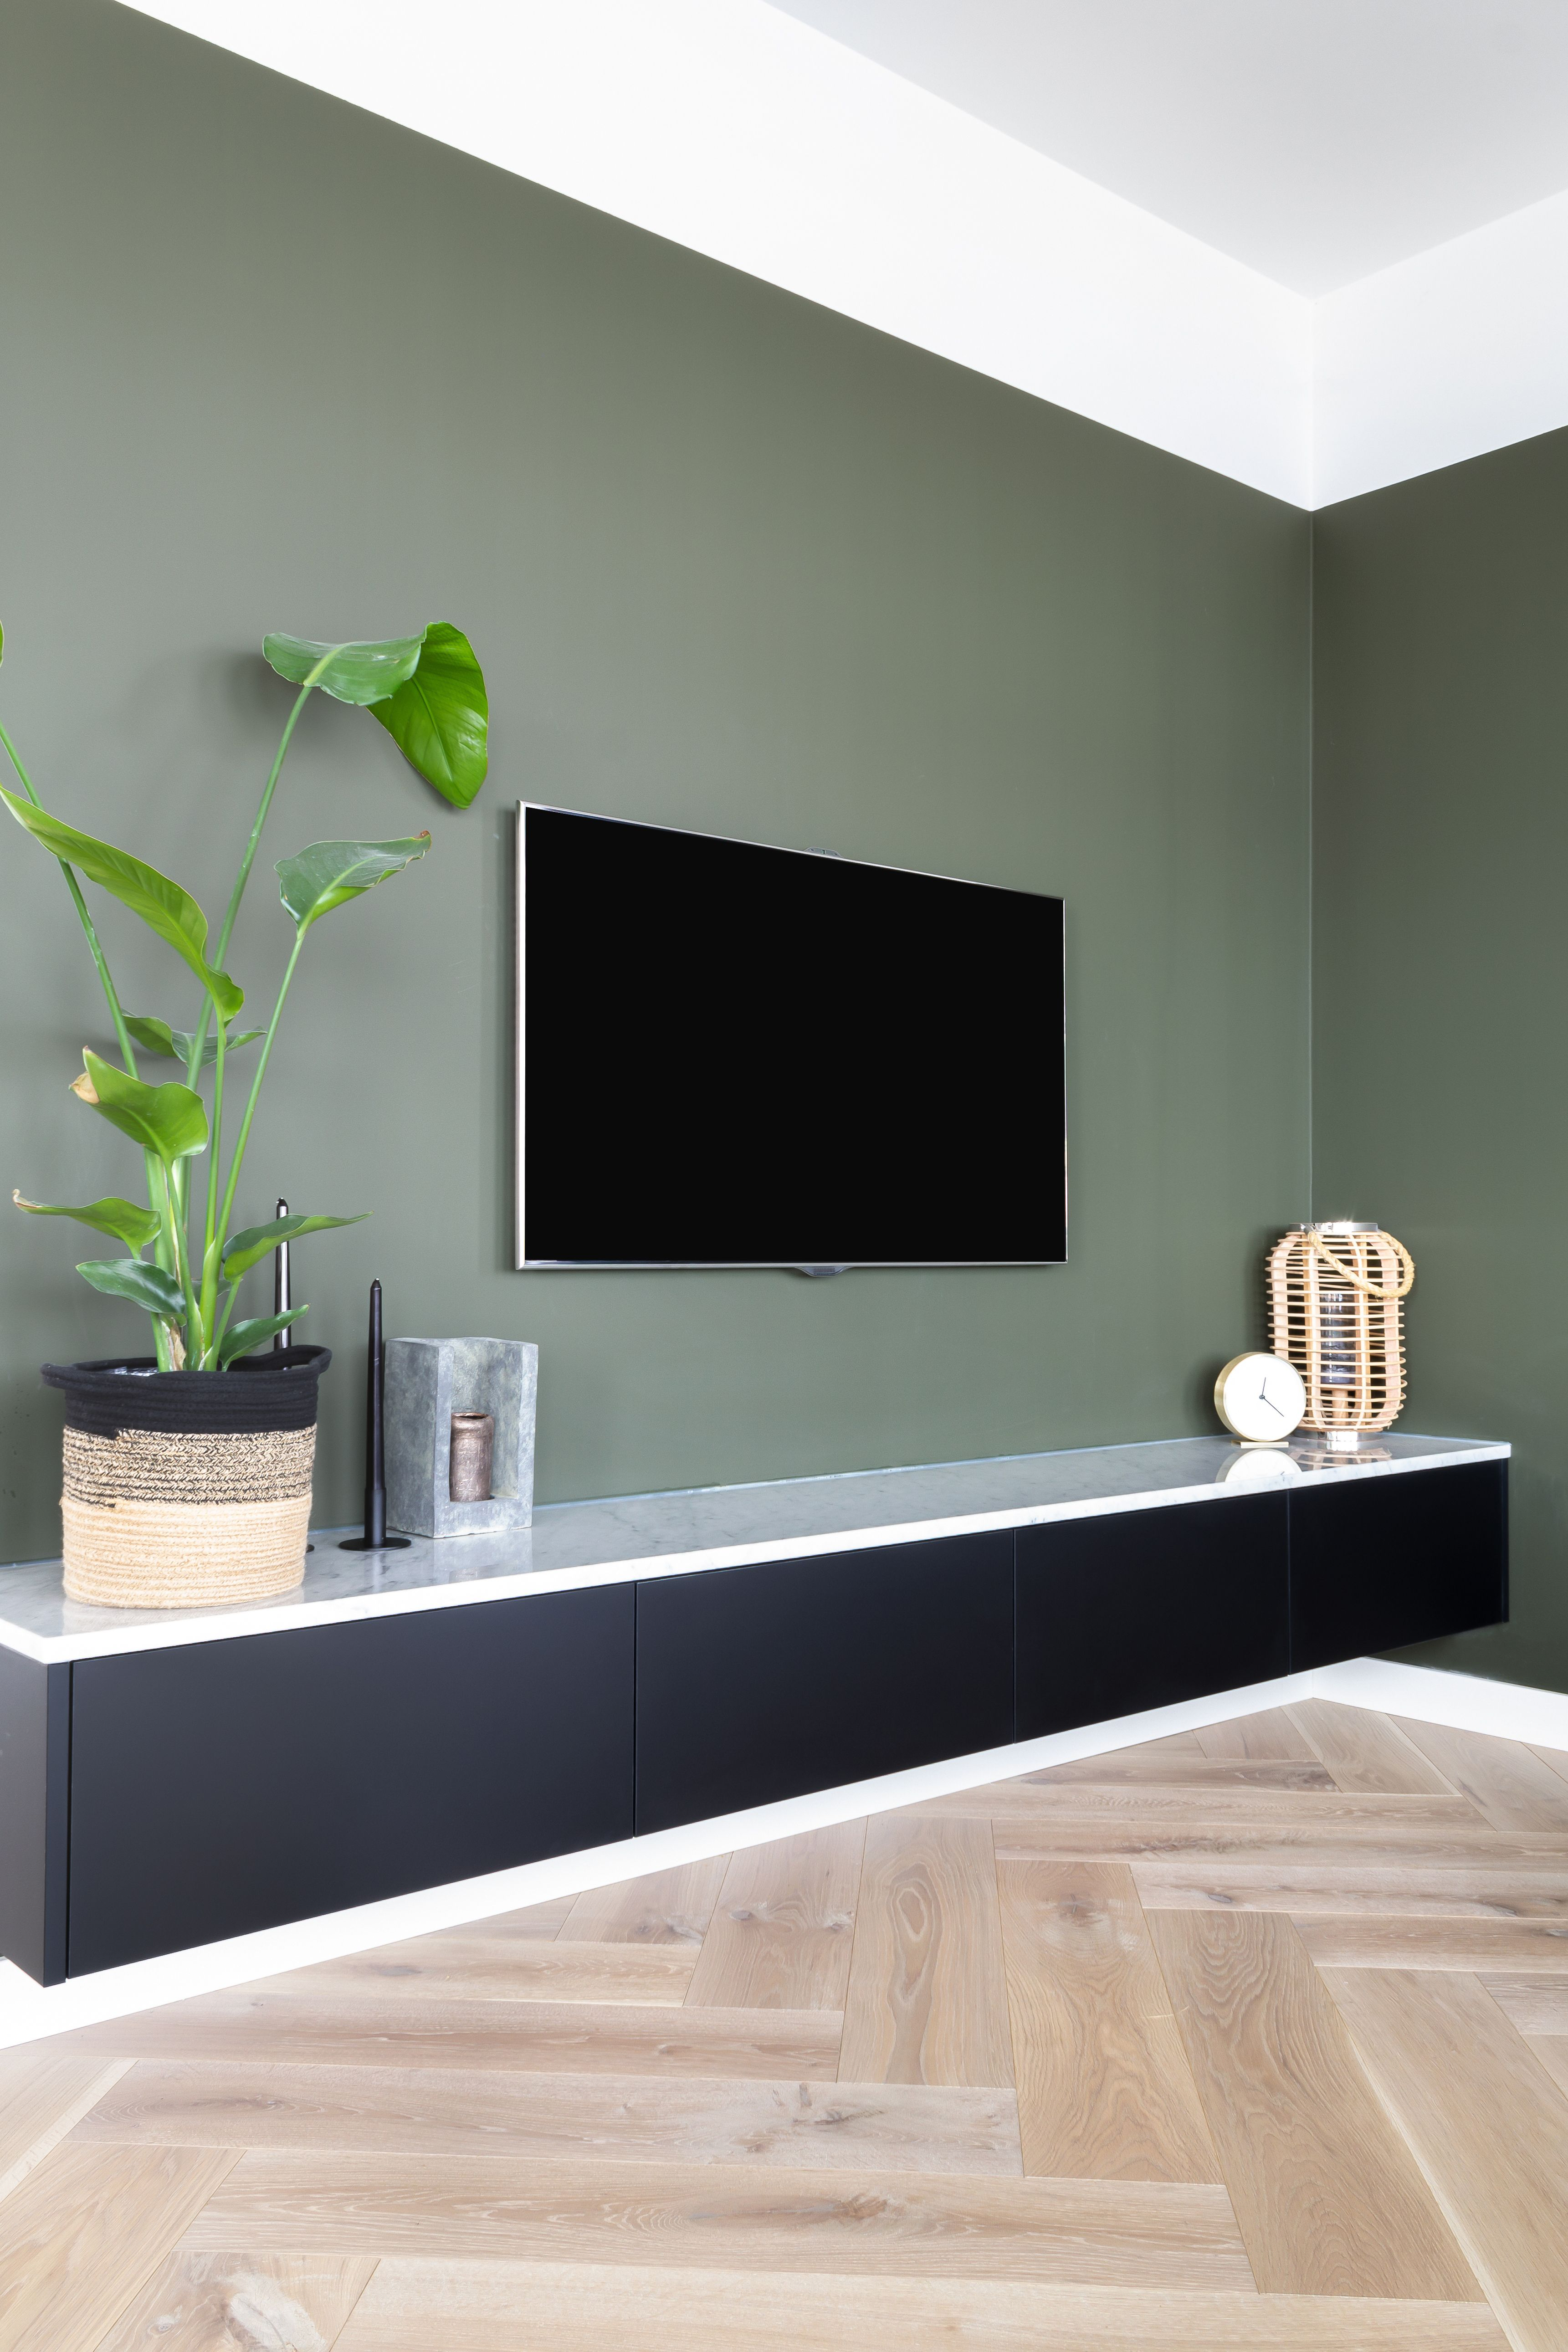 Modern interieur met marmer en eiken